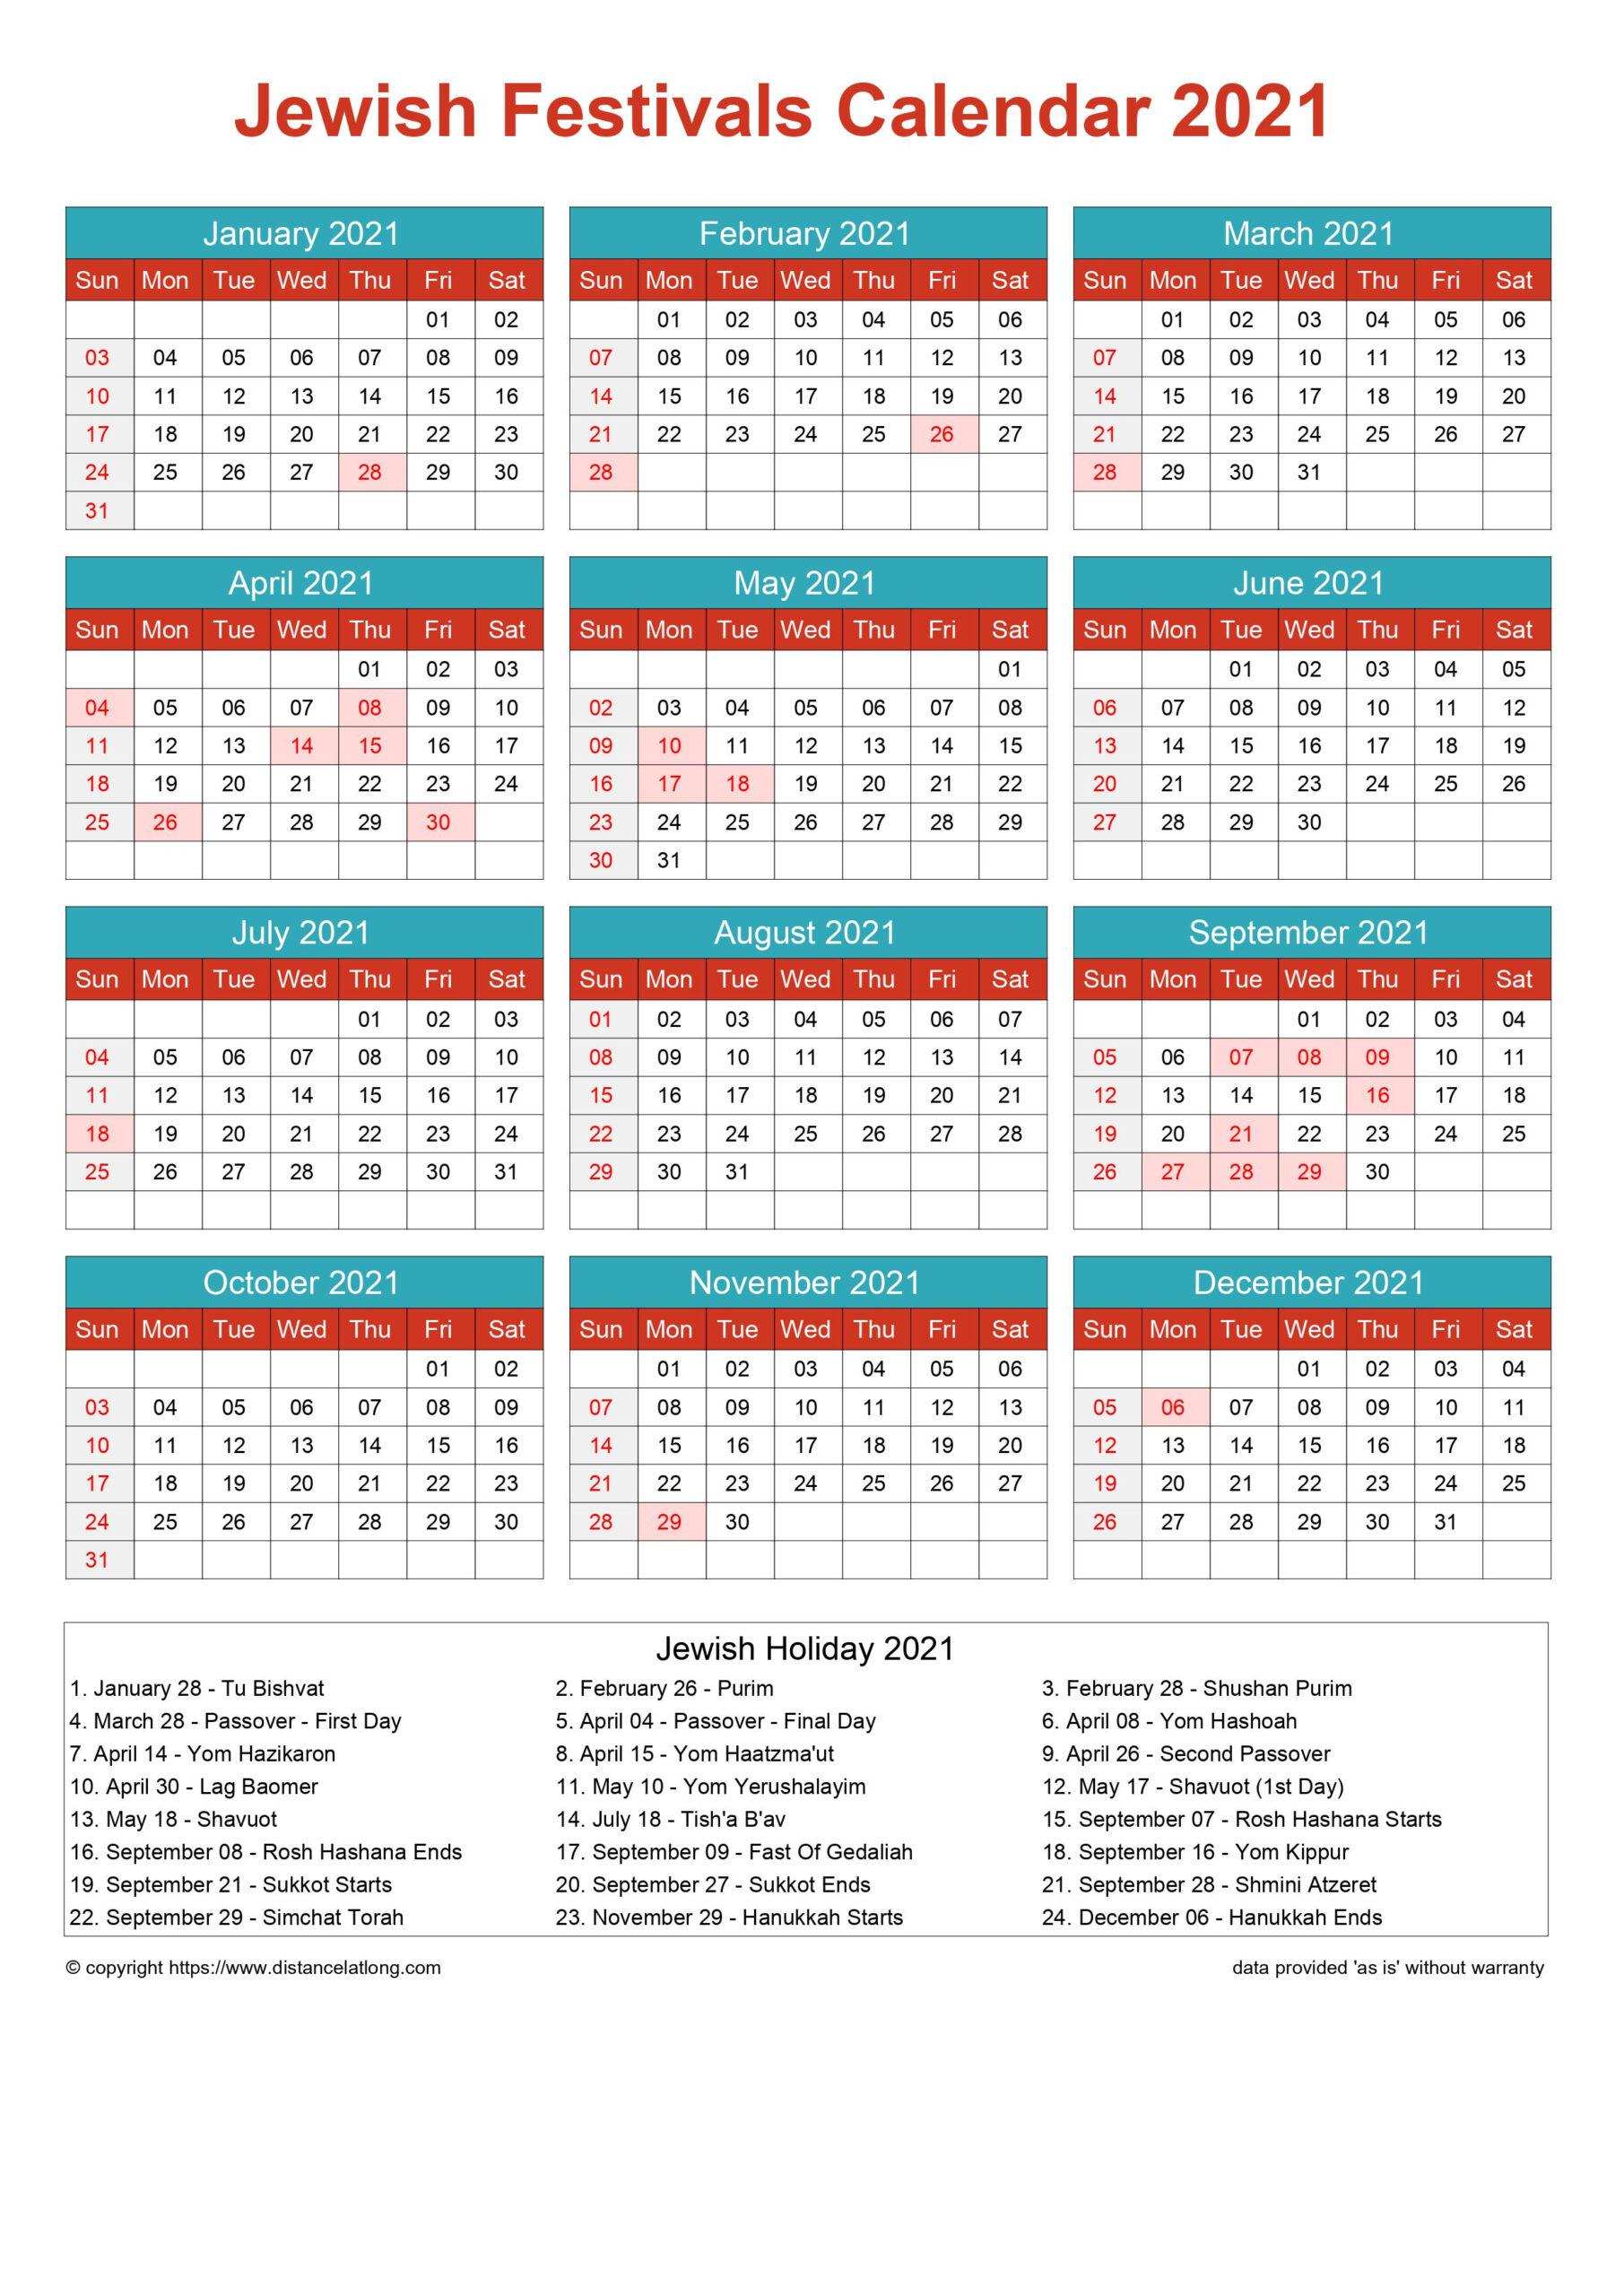 Calendar Horizintal Grid Sunday To Saturday Jewish Holiday